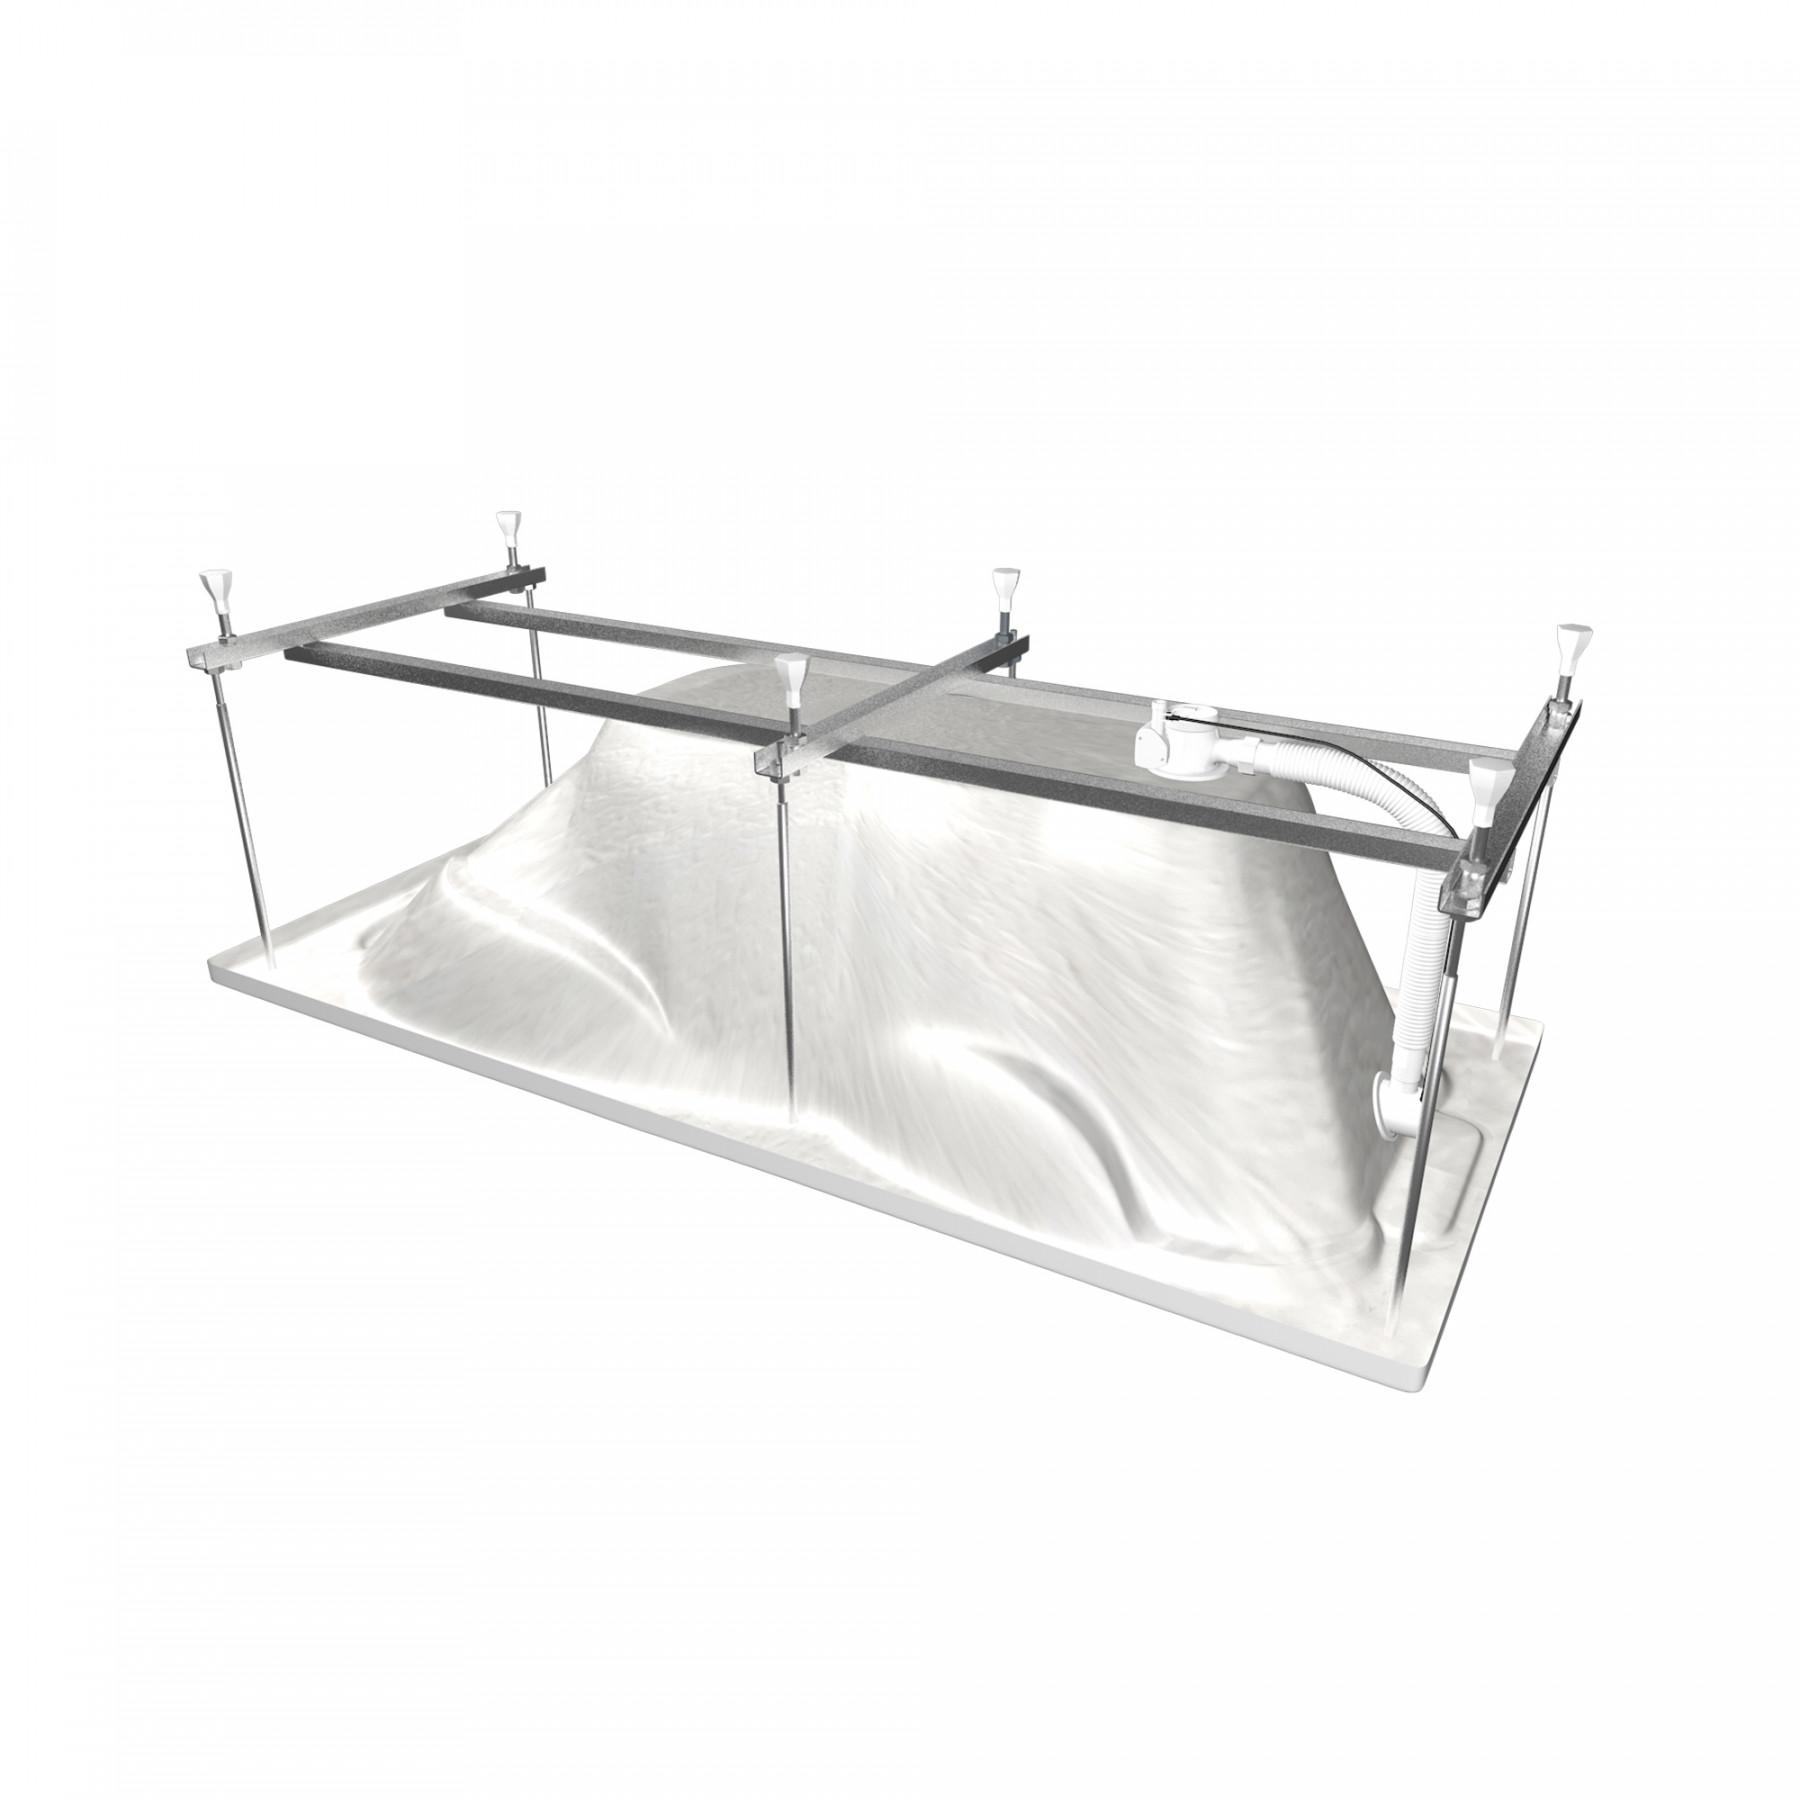 Акриловая ванна Triton Персей 190x90